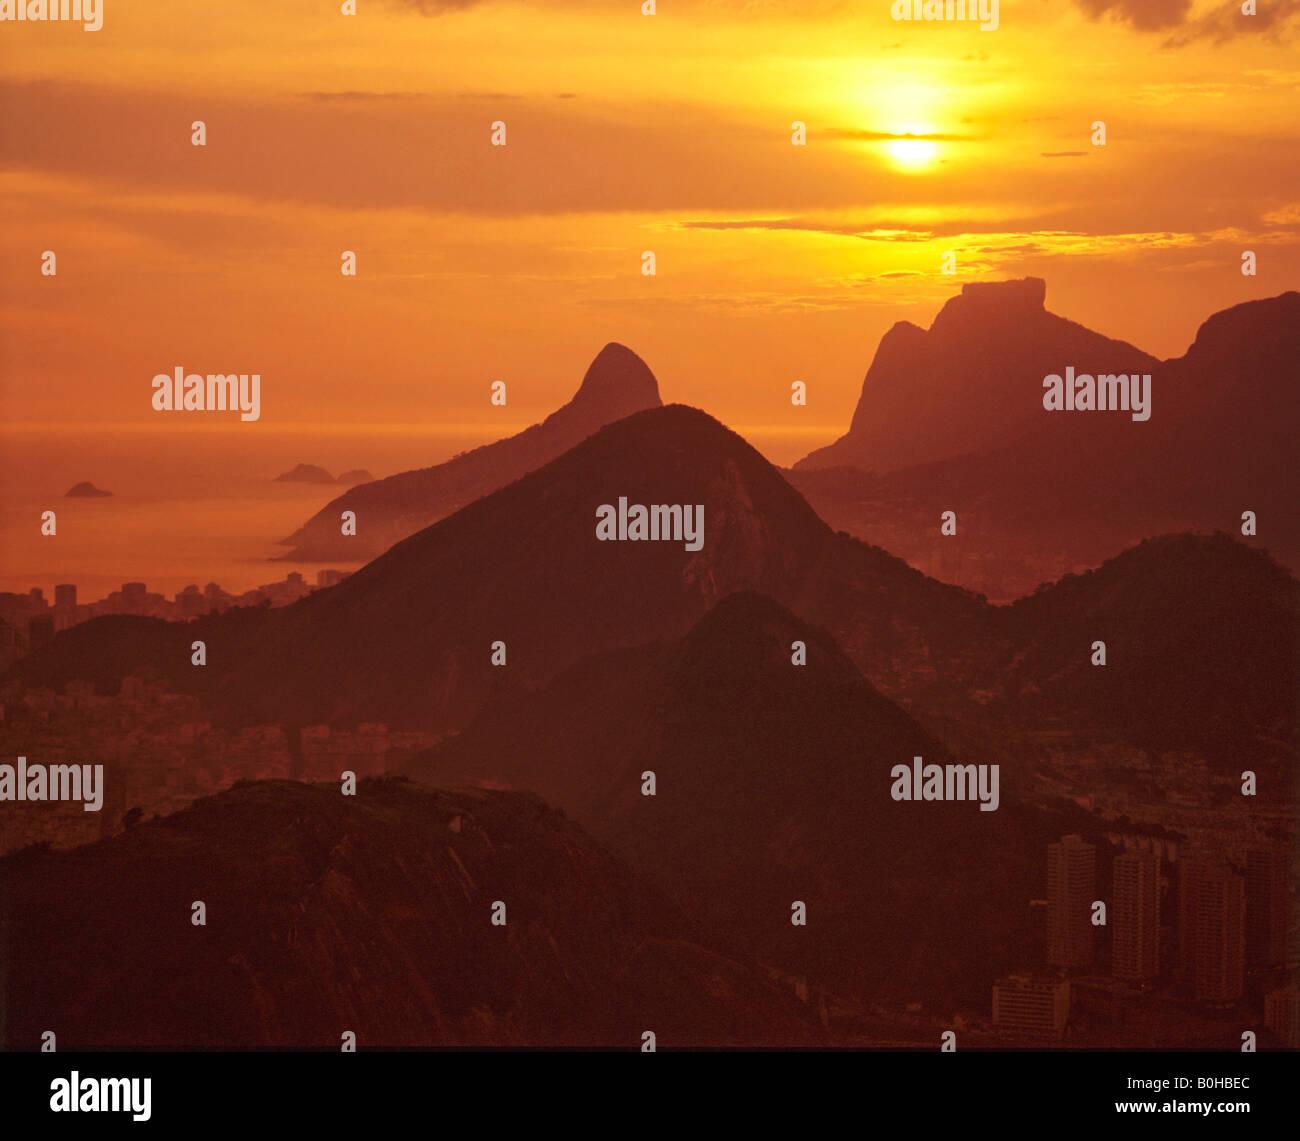 Rio de Janeiro at sunset, Brazil, South America - Stock Image